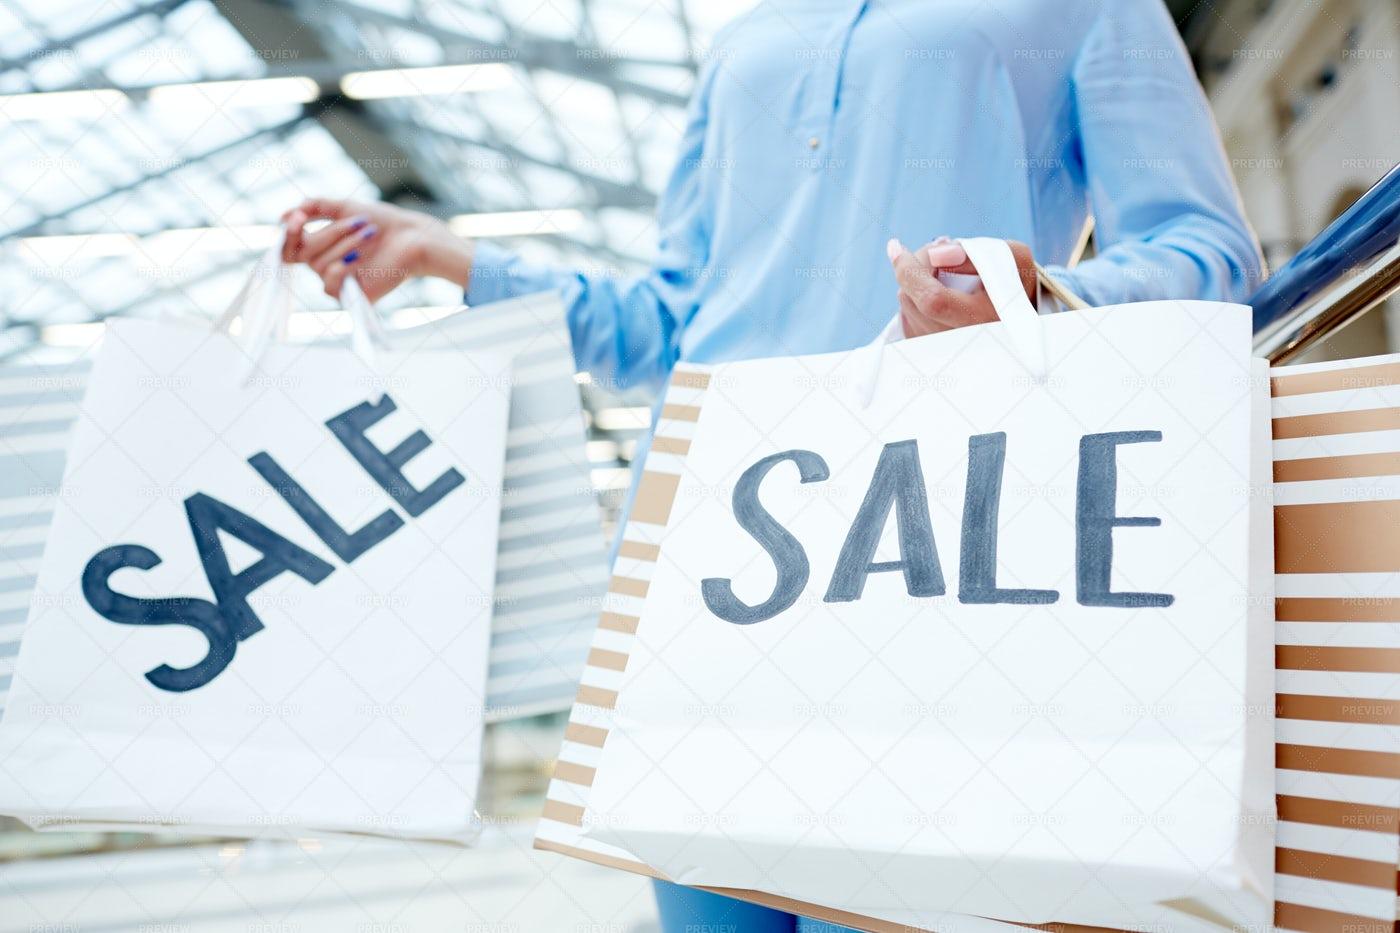 Sale Paperbags: Stock Photos